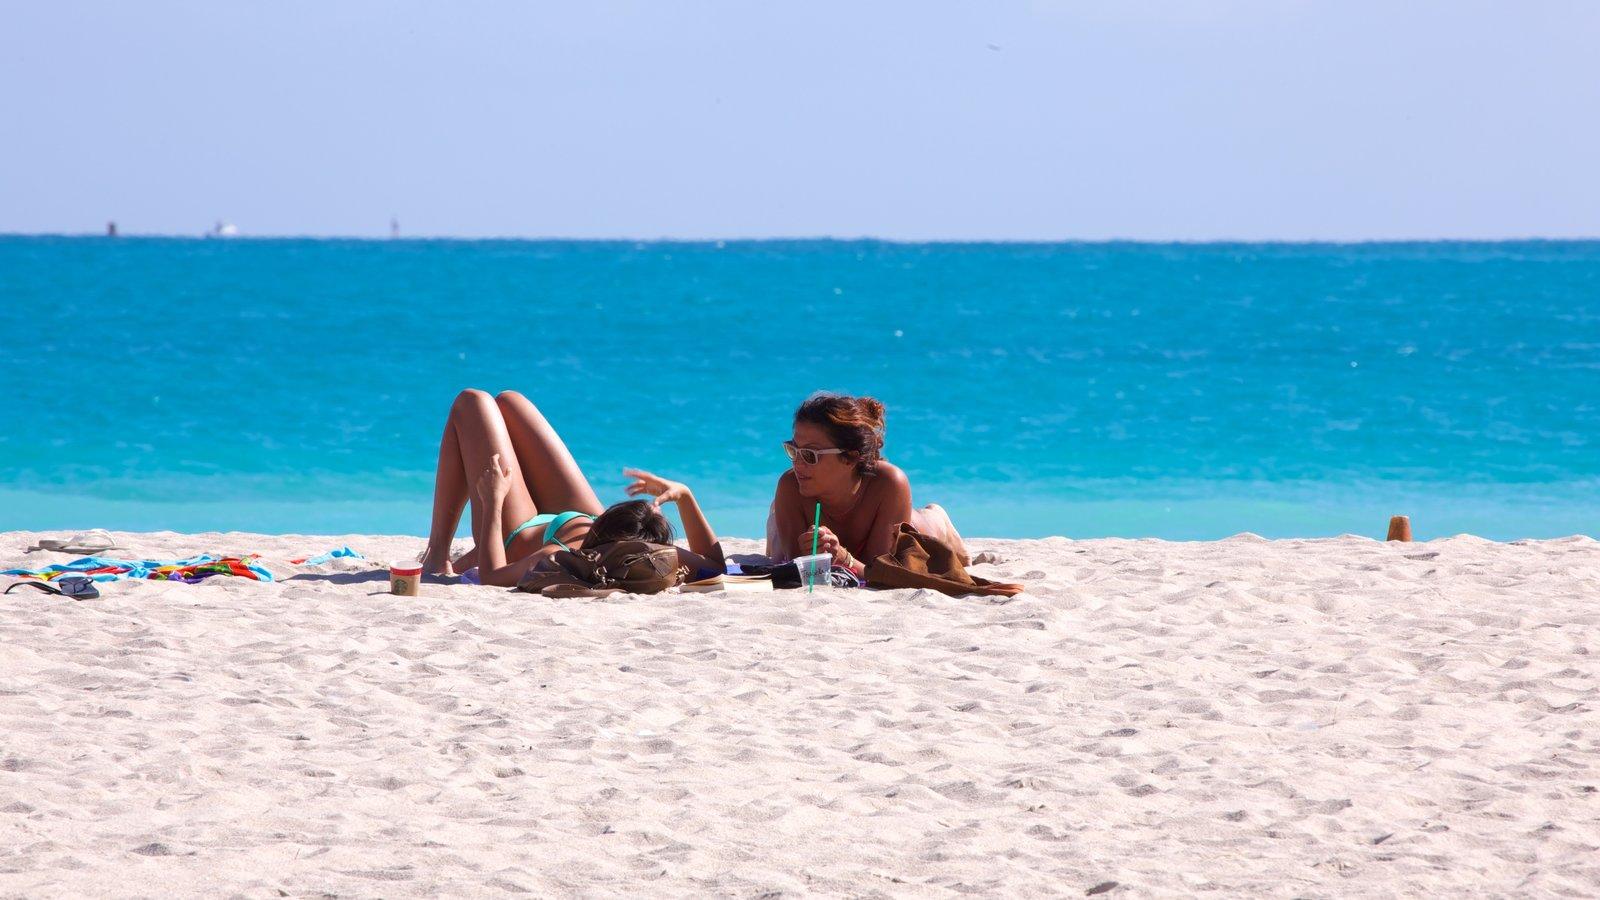 Miami Beach showing a beach, tropical scenes and landscape views